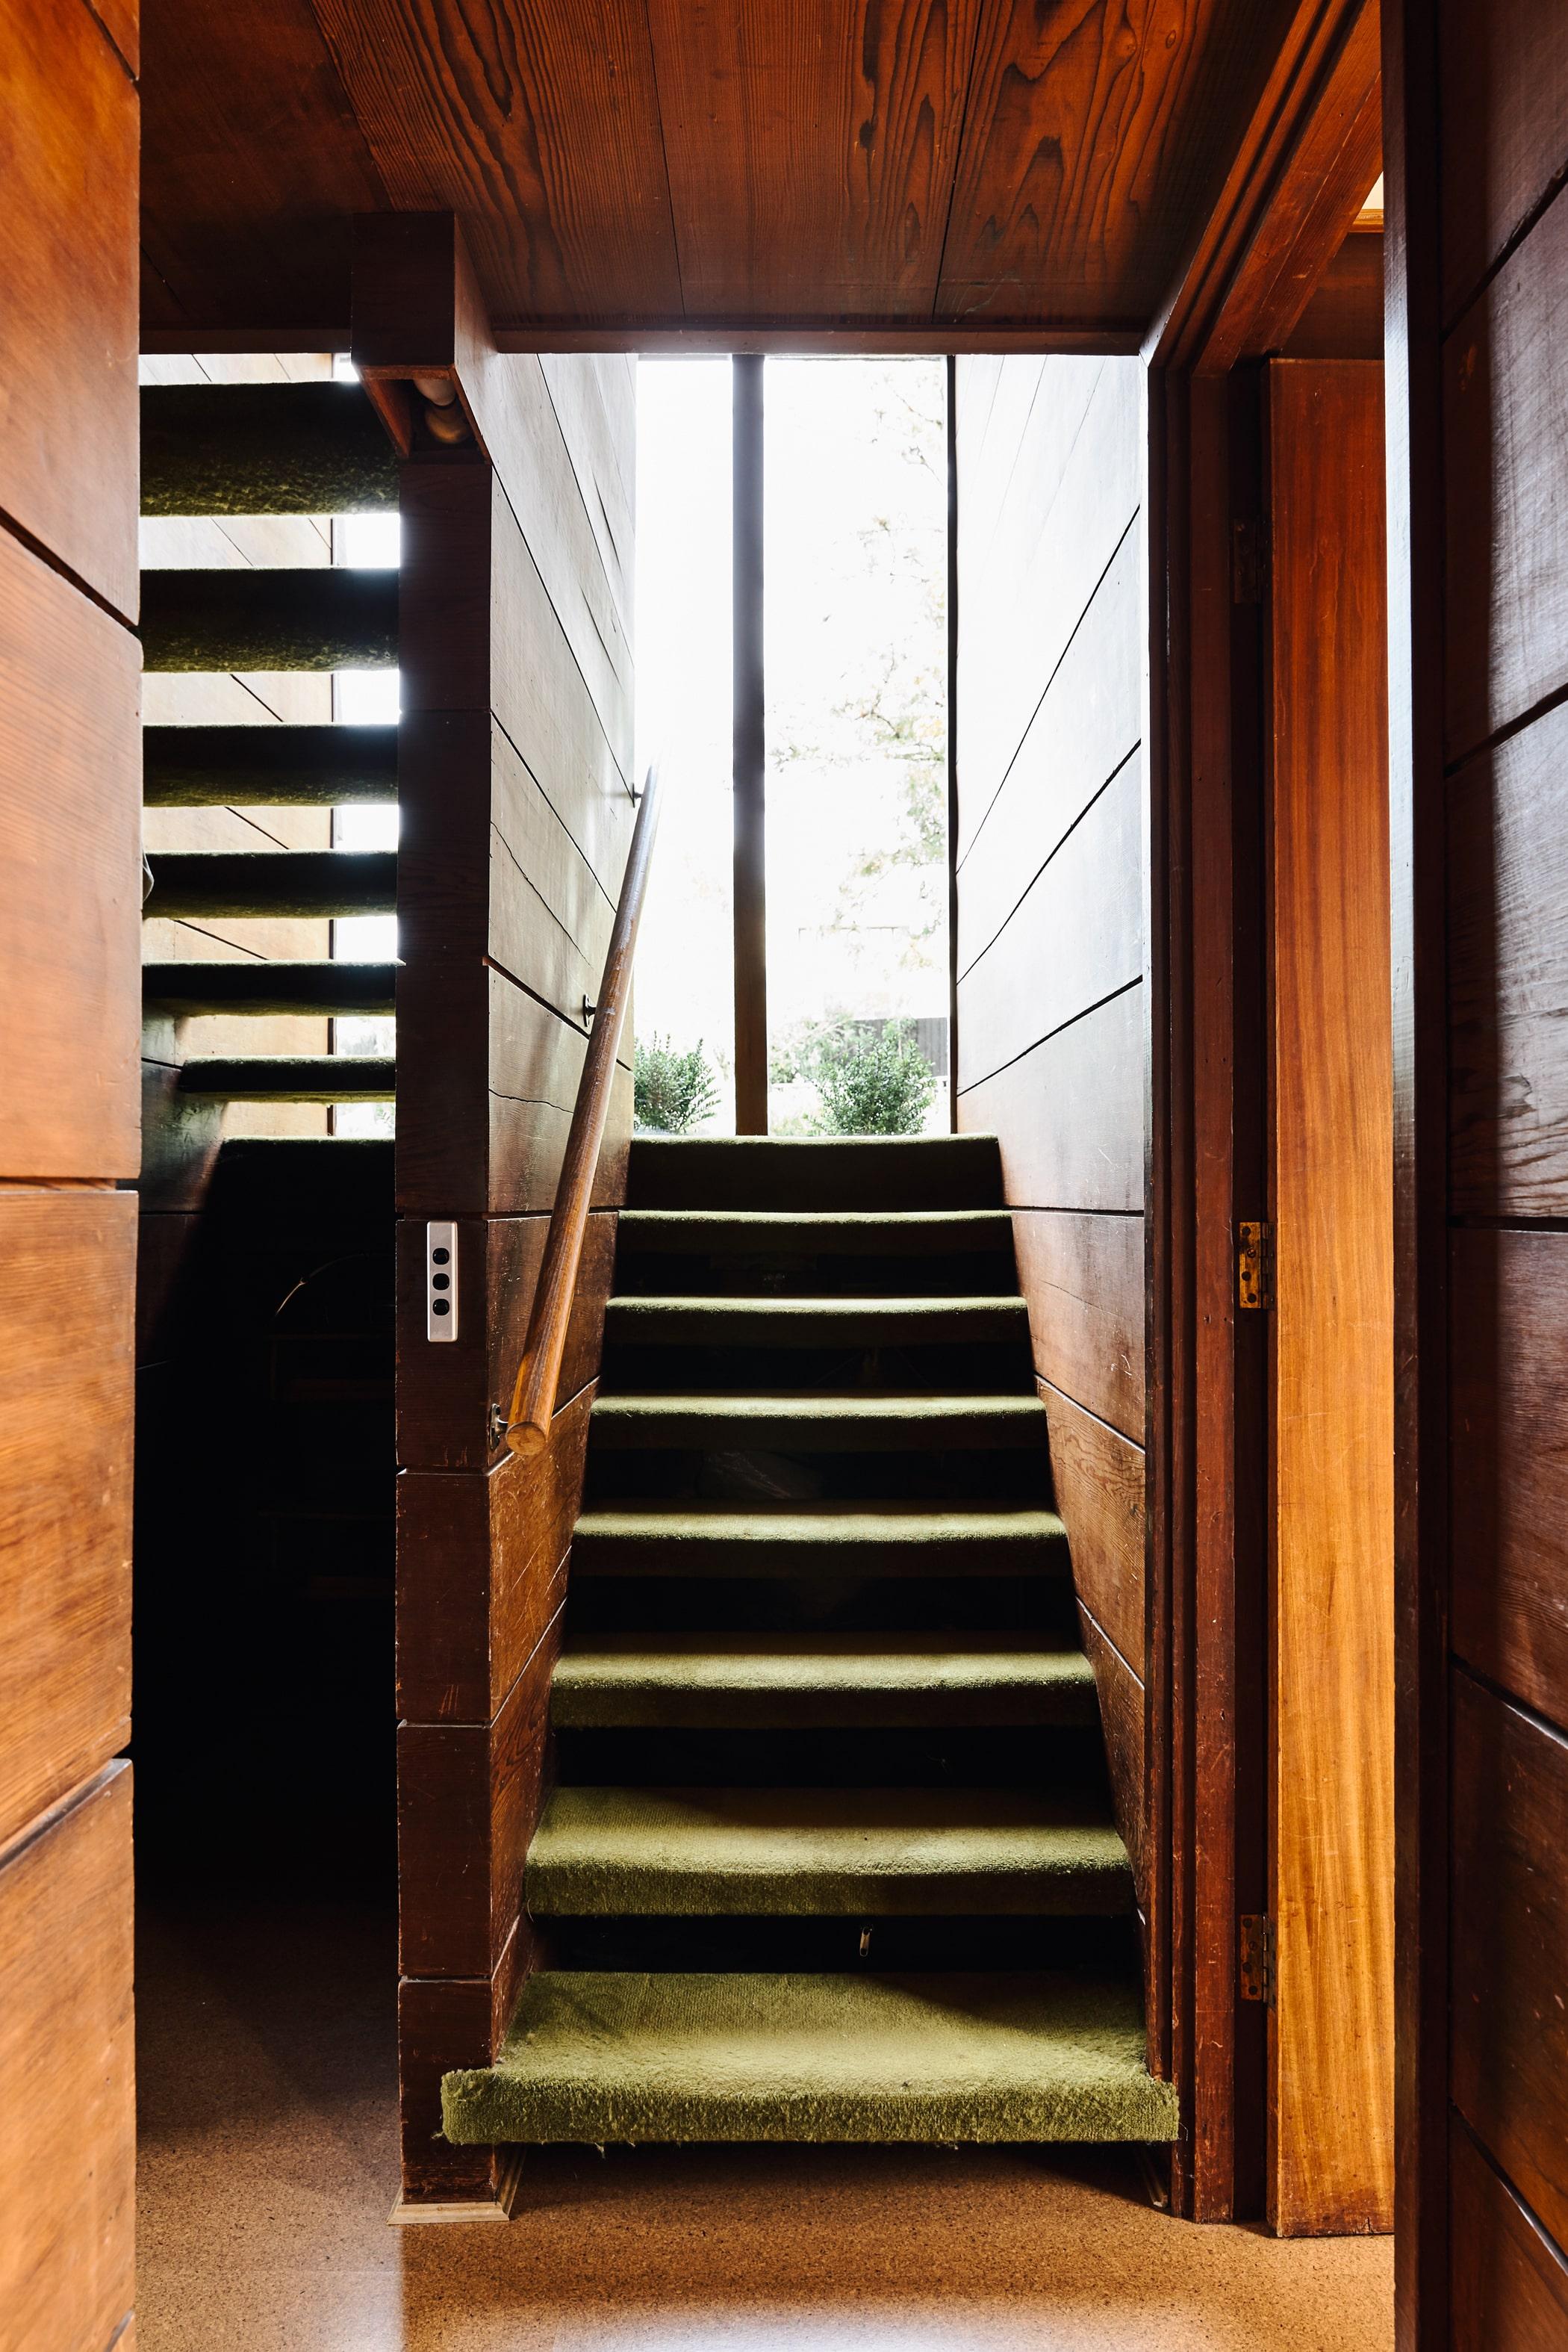 Gallery Of The Godsell House By David Godsell Local Australian Mid Century Modern Architecture Beaumaris, Vic Image 8